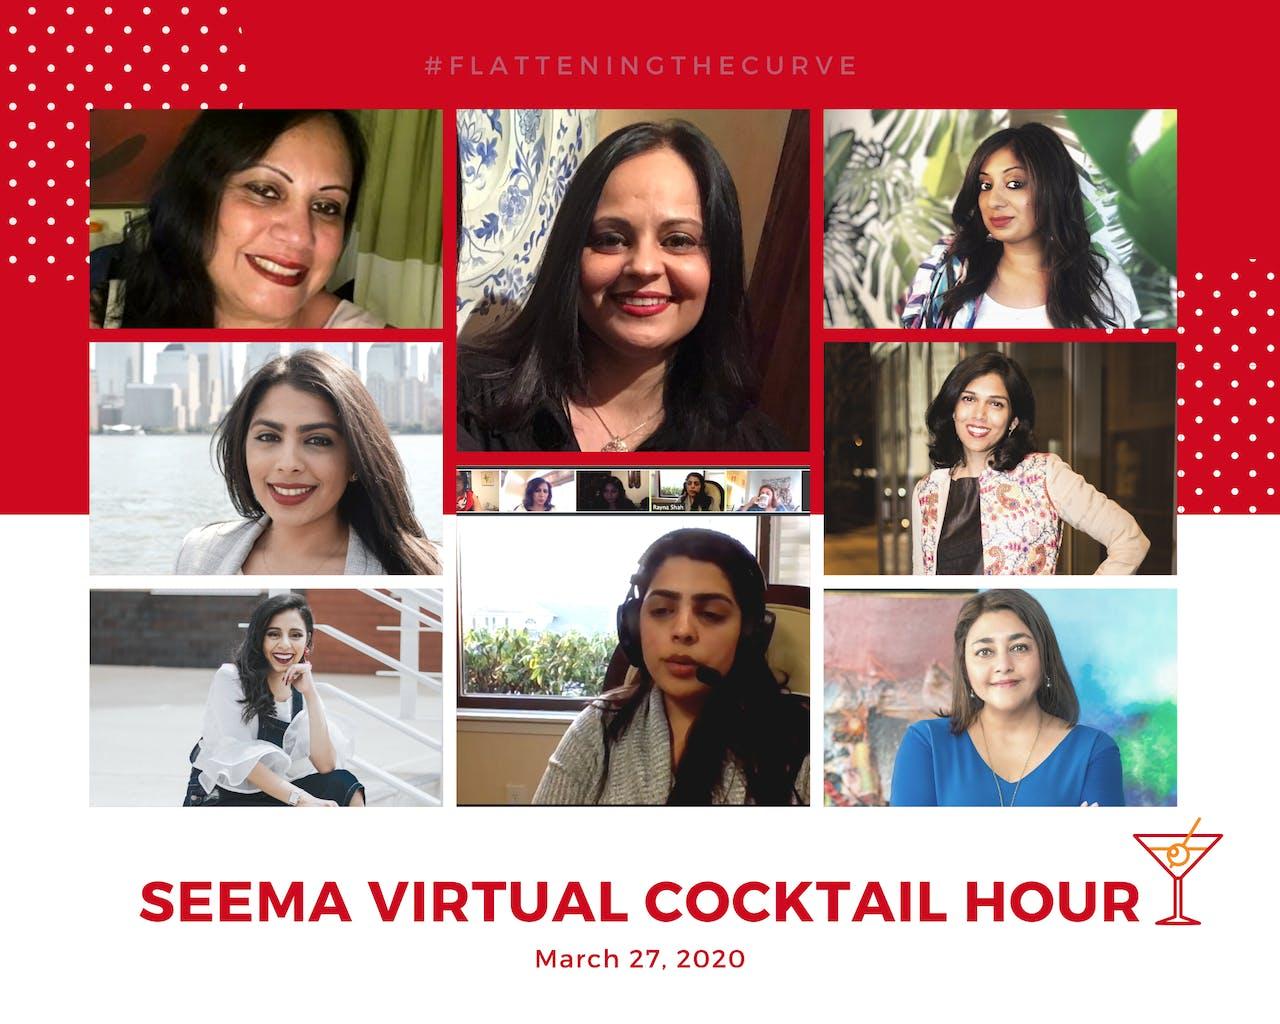 seema.com, seema network, seema events, seema newsletter, seema virtual cocktail hour seema social, seema hour during quarantine, seema march 2020, seema events 2020